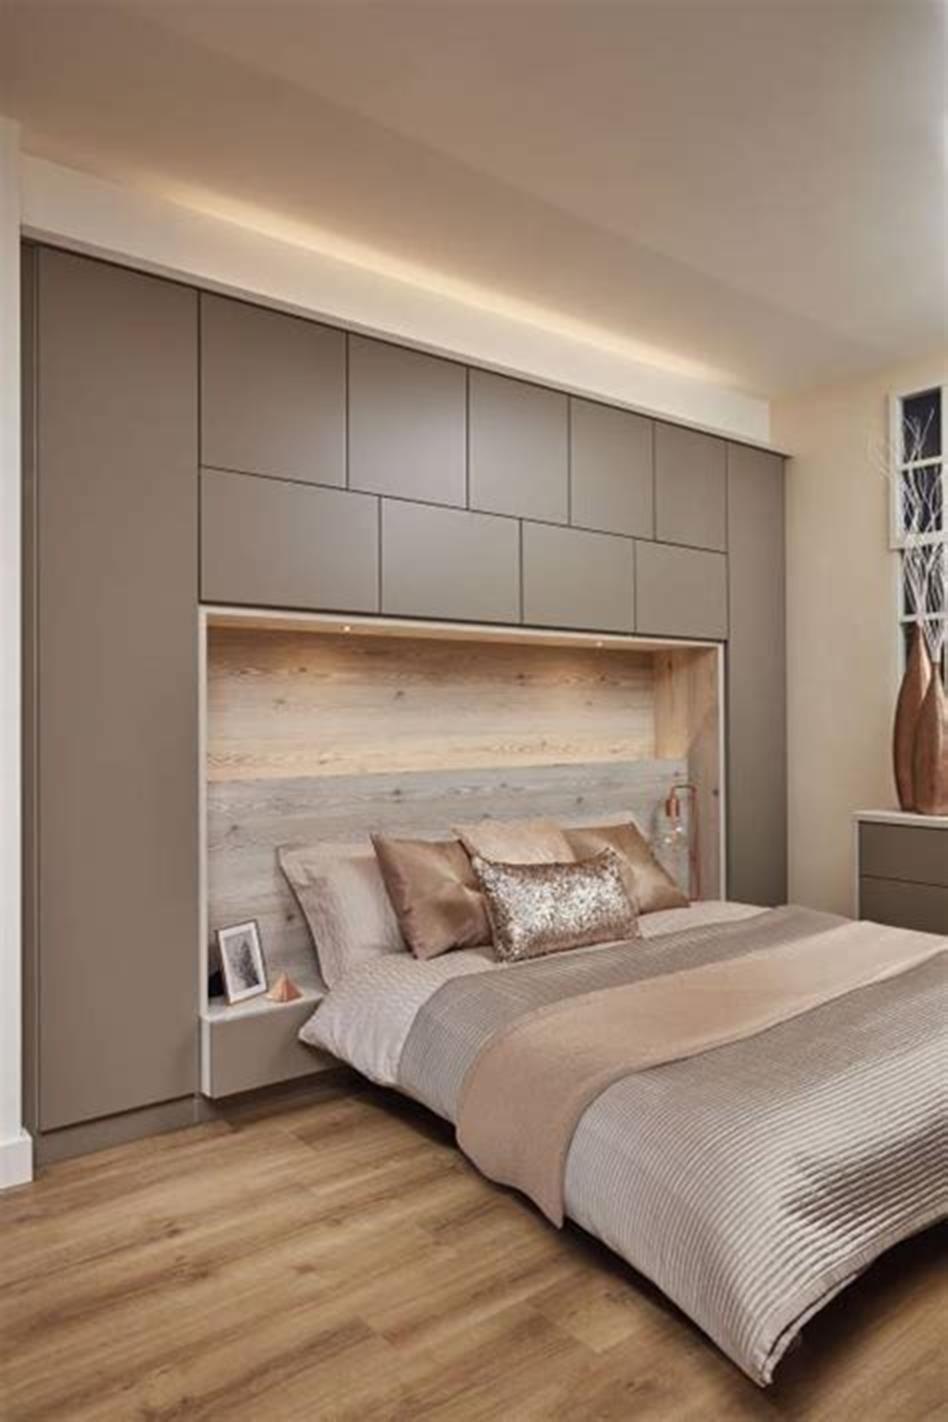 Minimalist Home Decor Ideas20